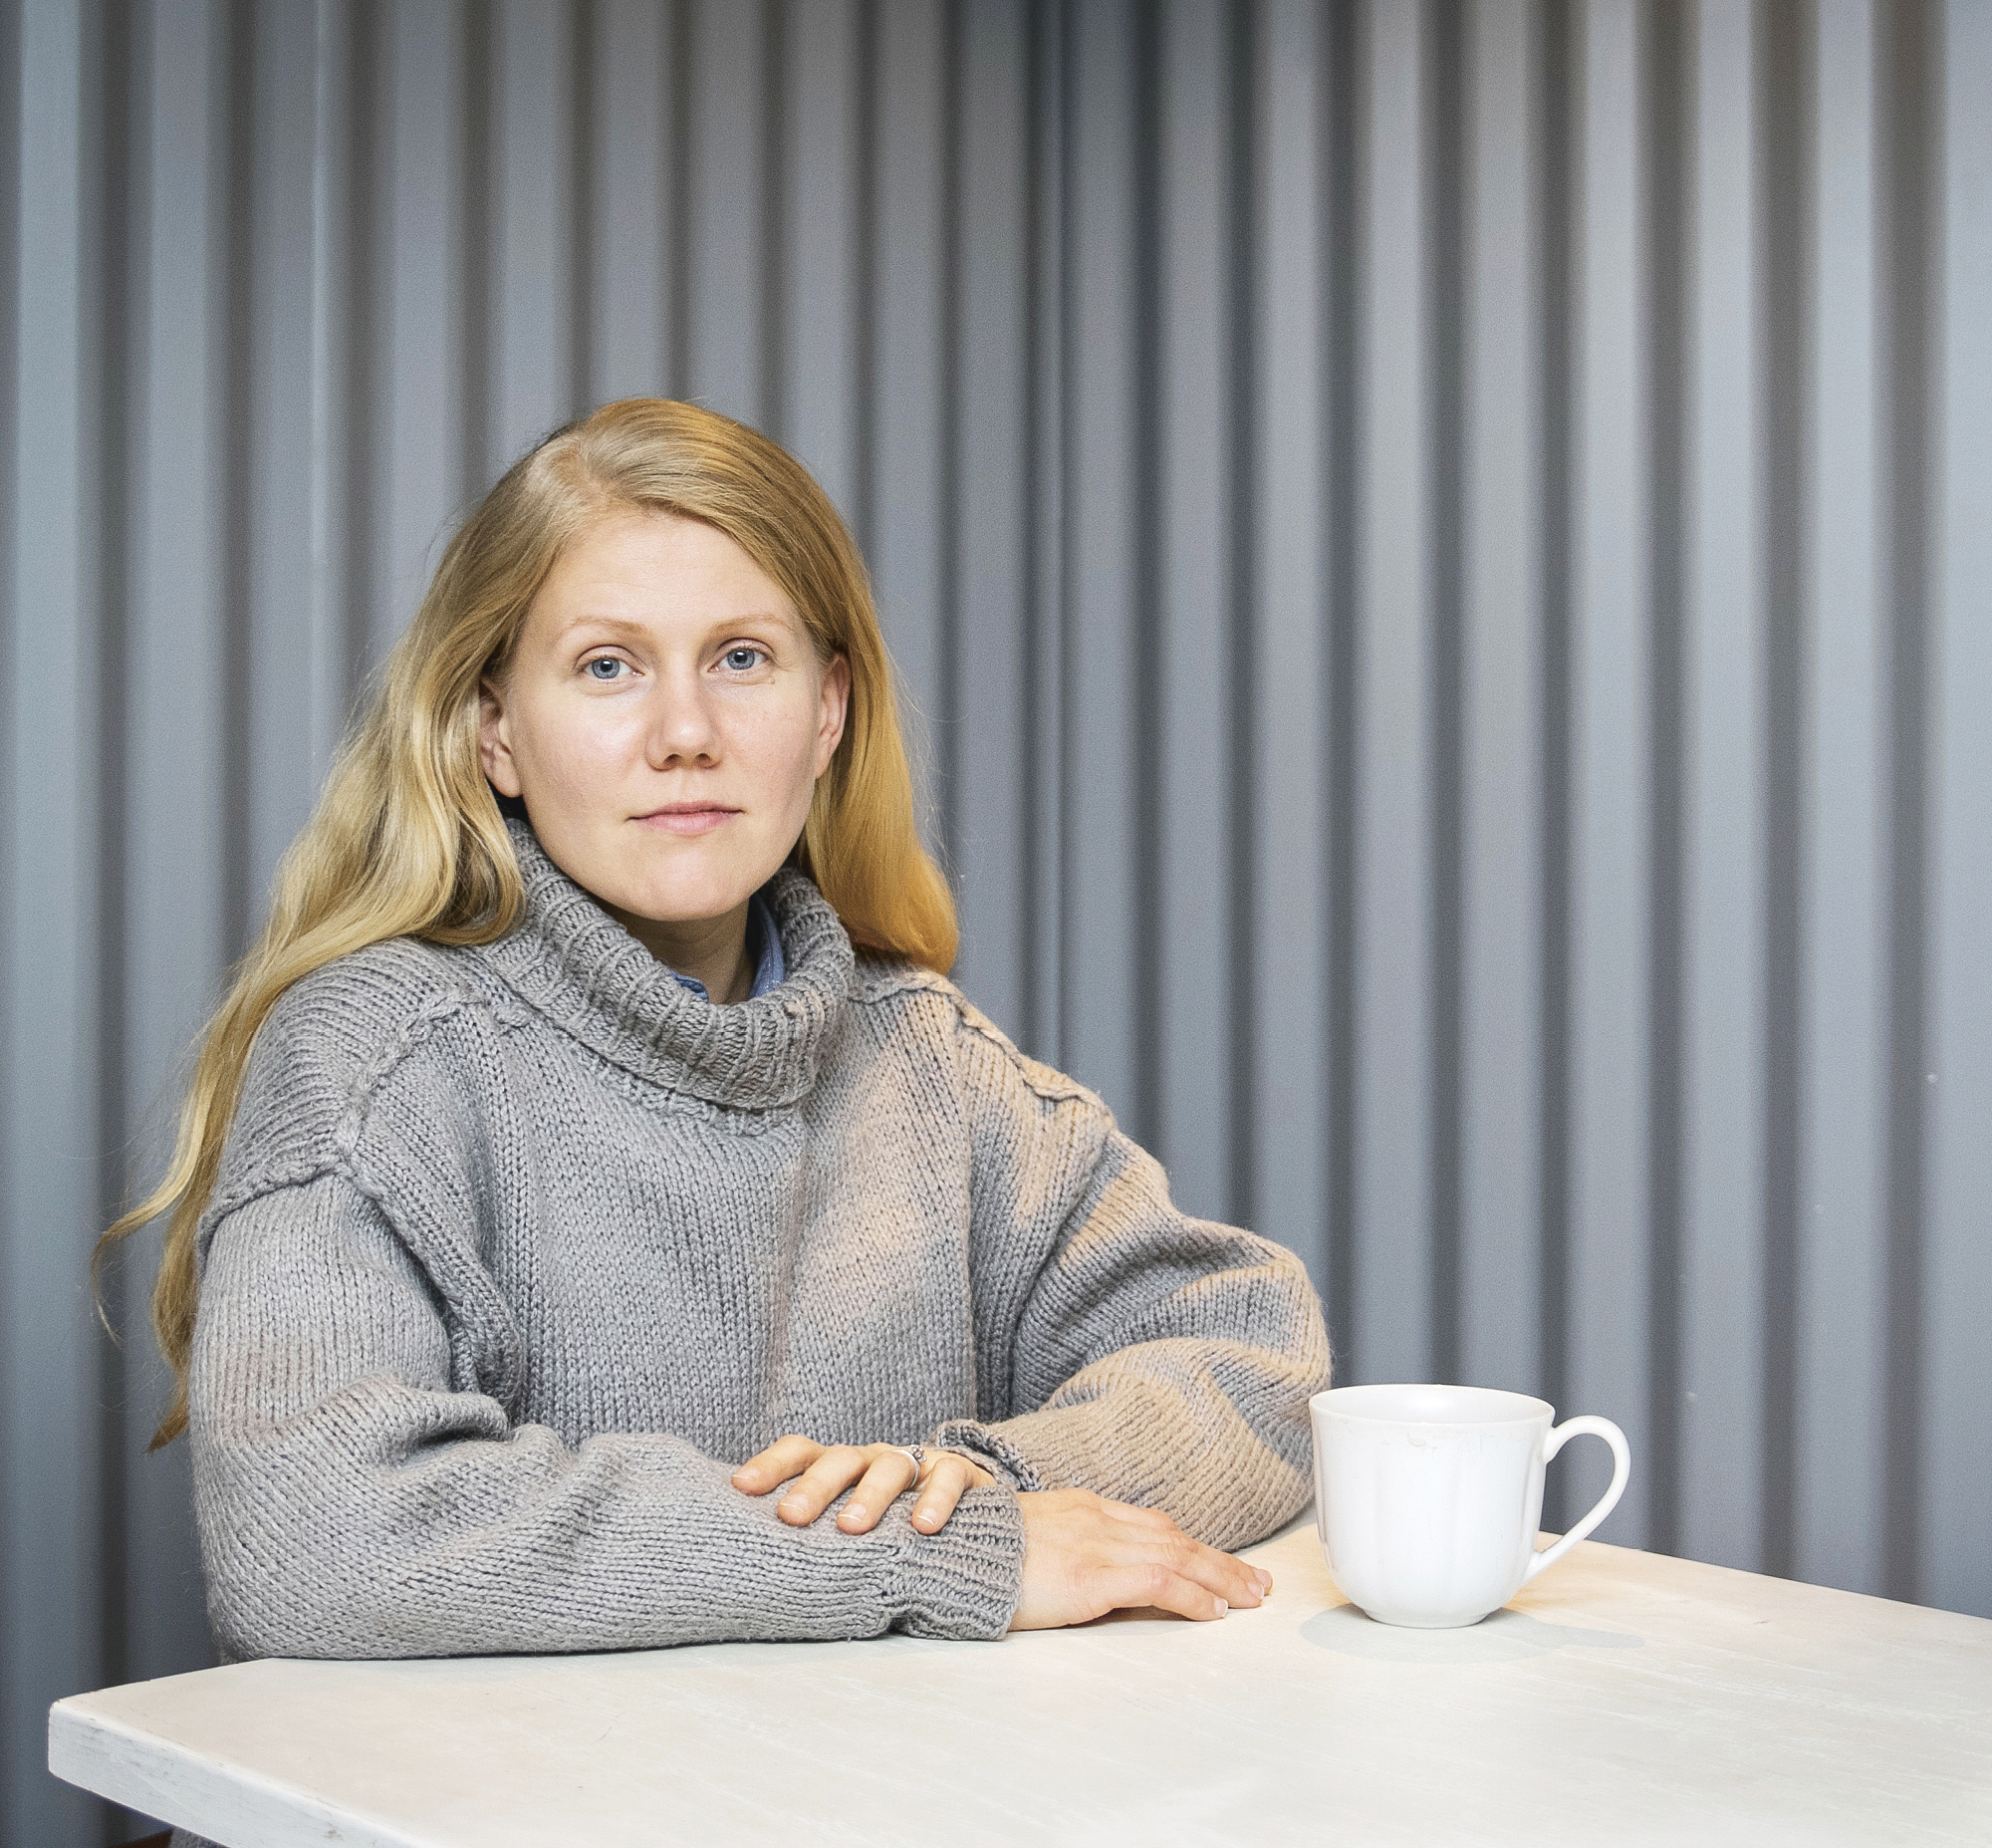 Kuva: Helena Hagberg